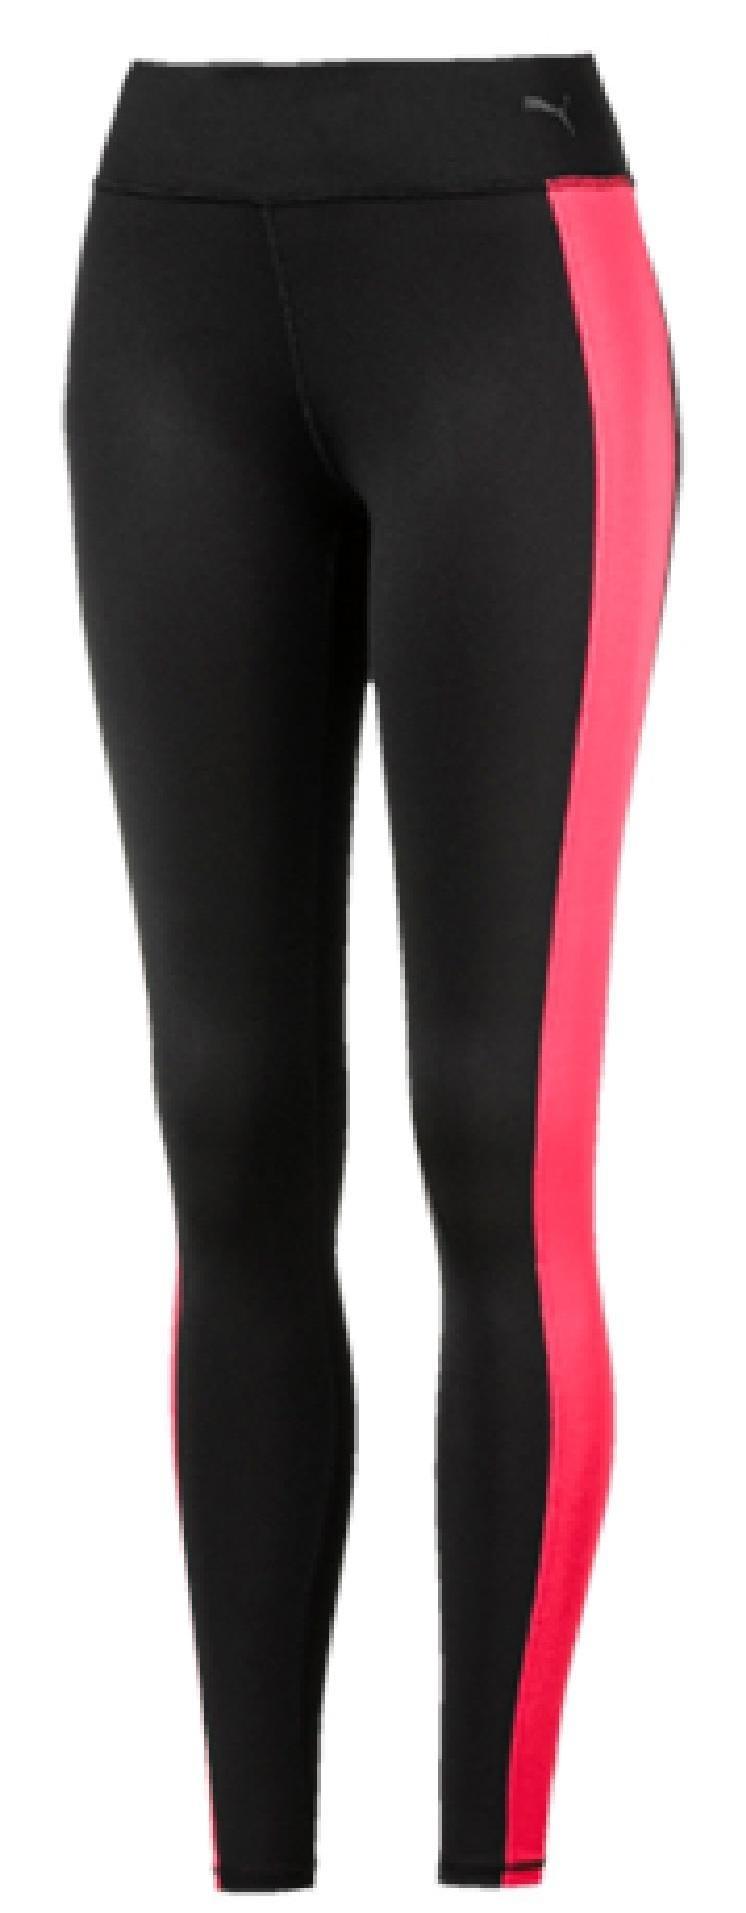 Spodnie sportowe damskie Puma niska cena